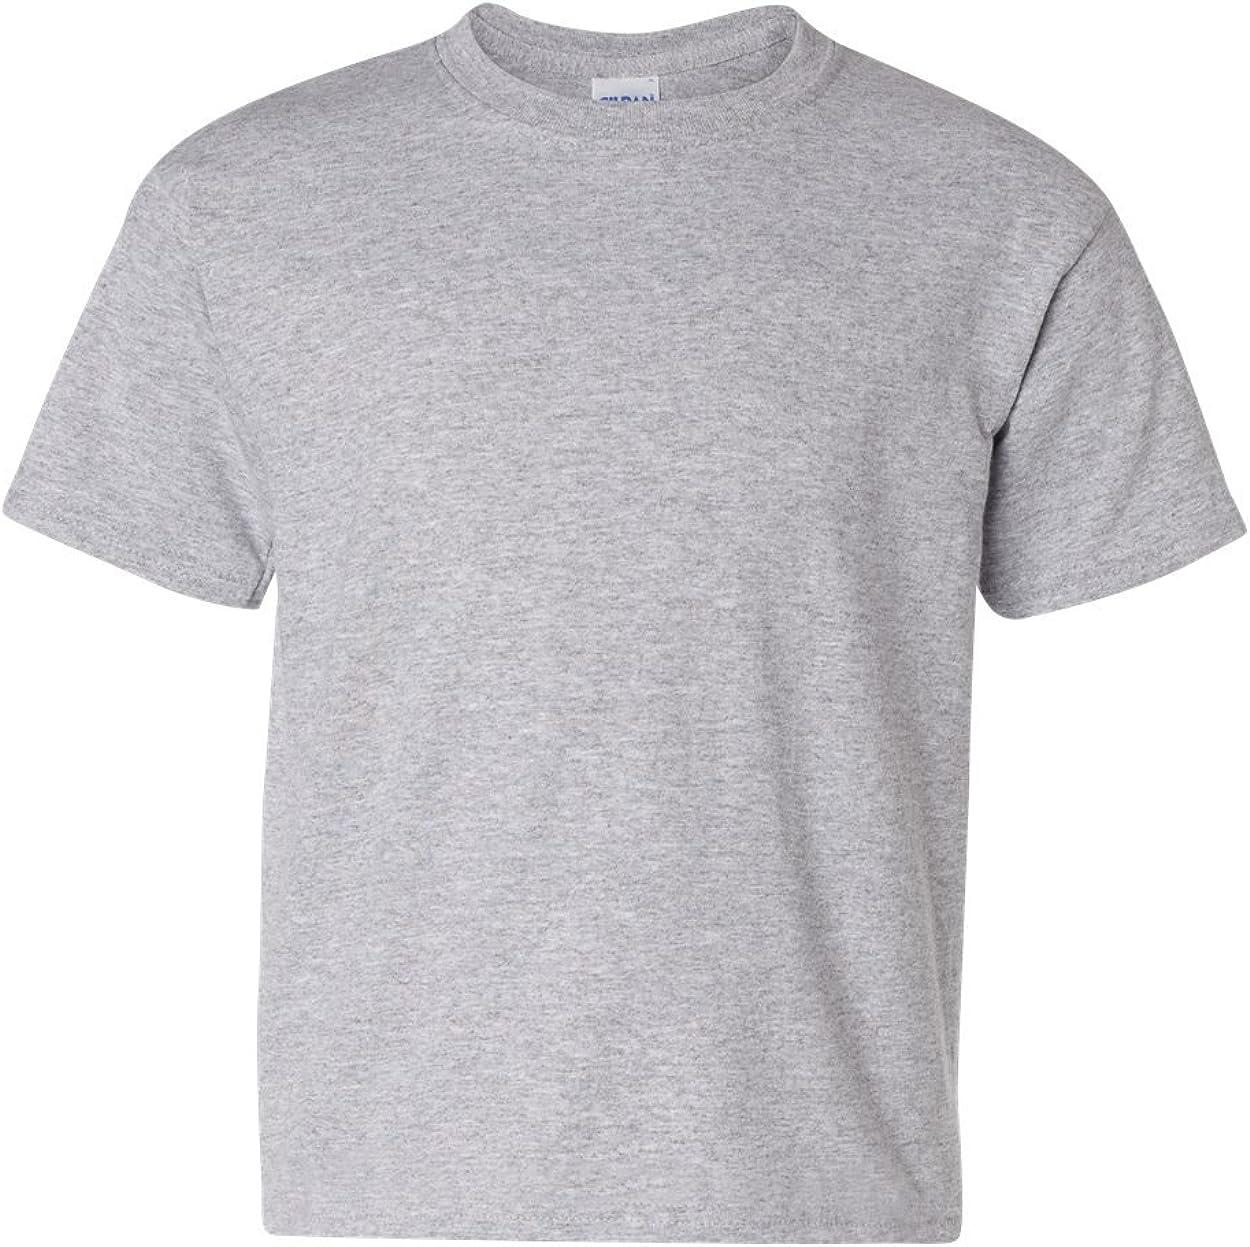 Heavy Cotton T-Shirt (G500B) Grey, M (Pack of 12)